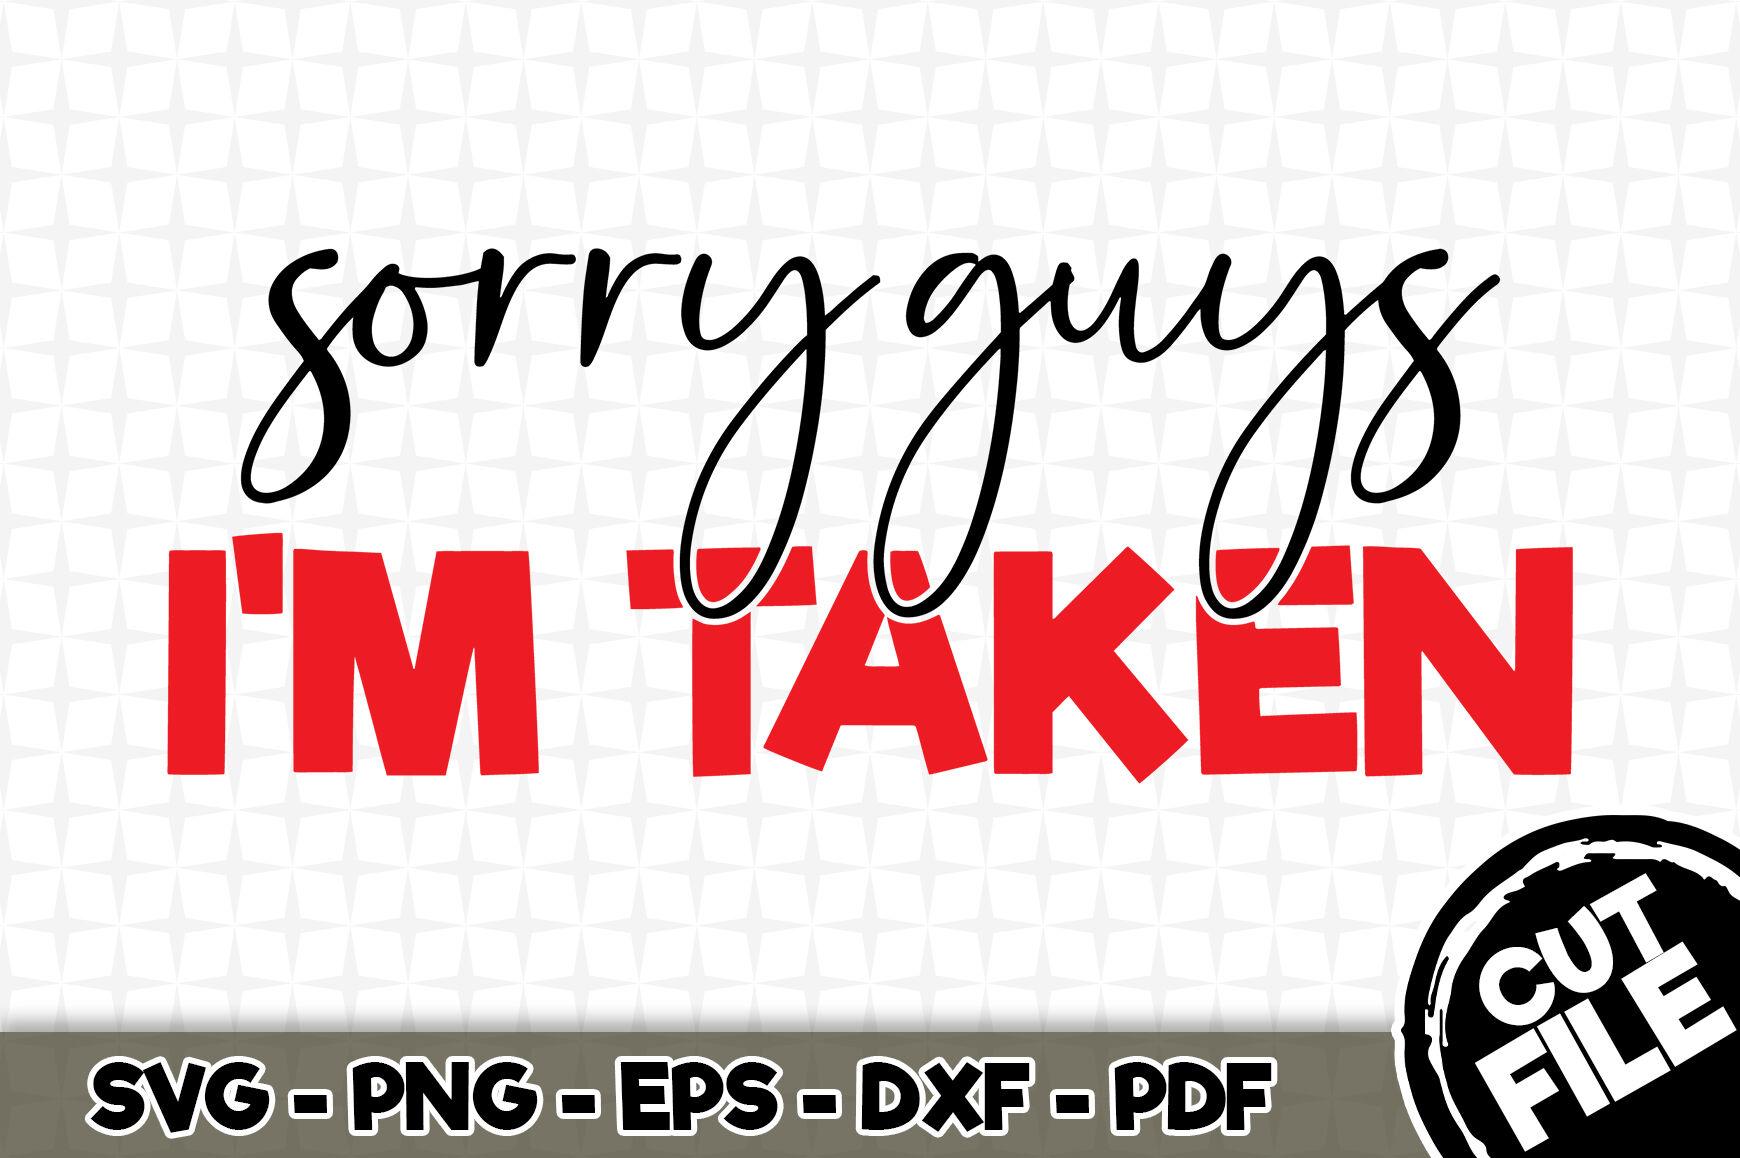 Sorry Guys I M Taken Svg Cut File 012 By Svgartsy Thehungryjpeg Com